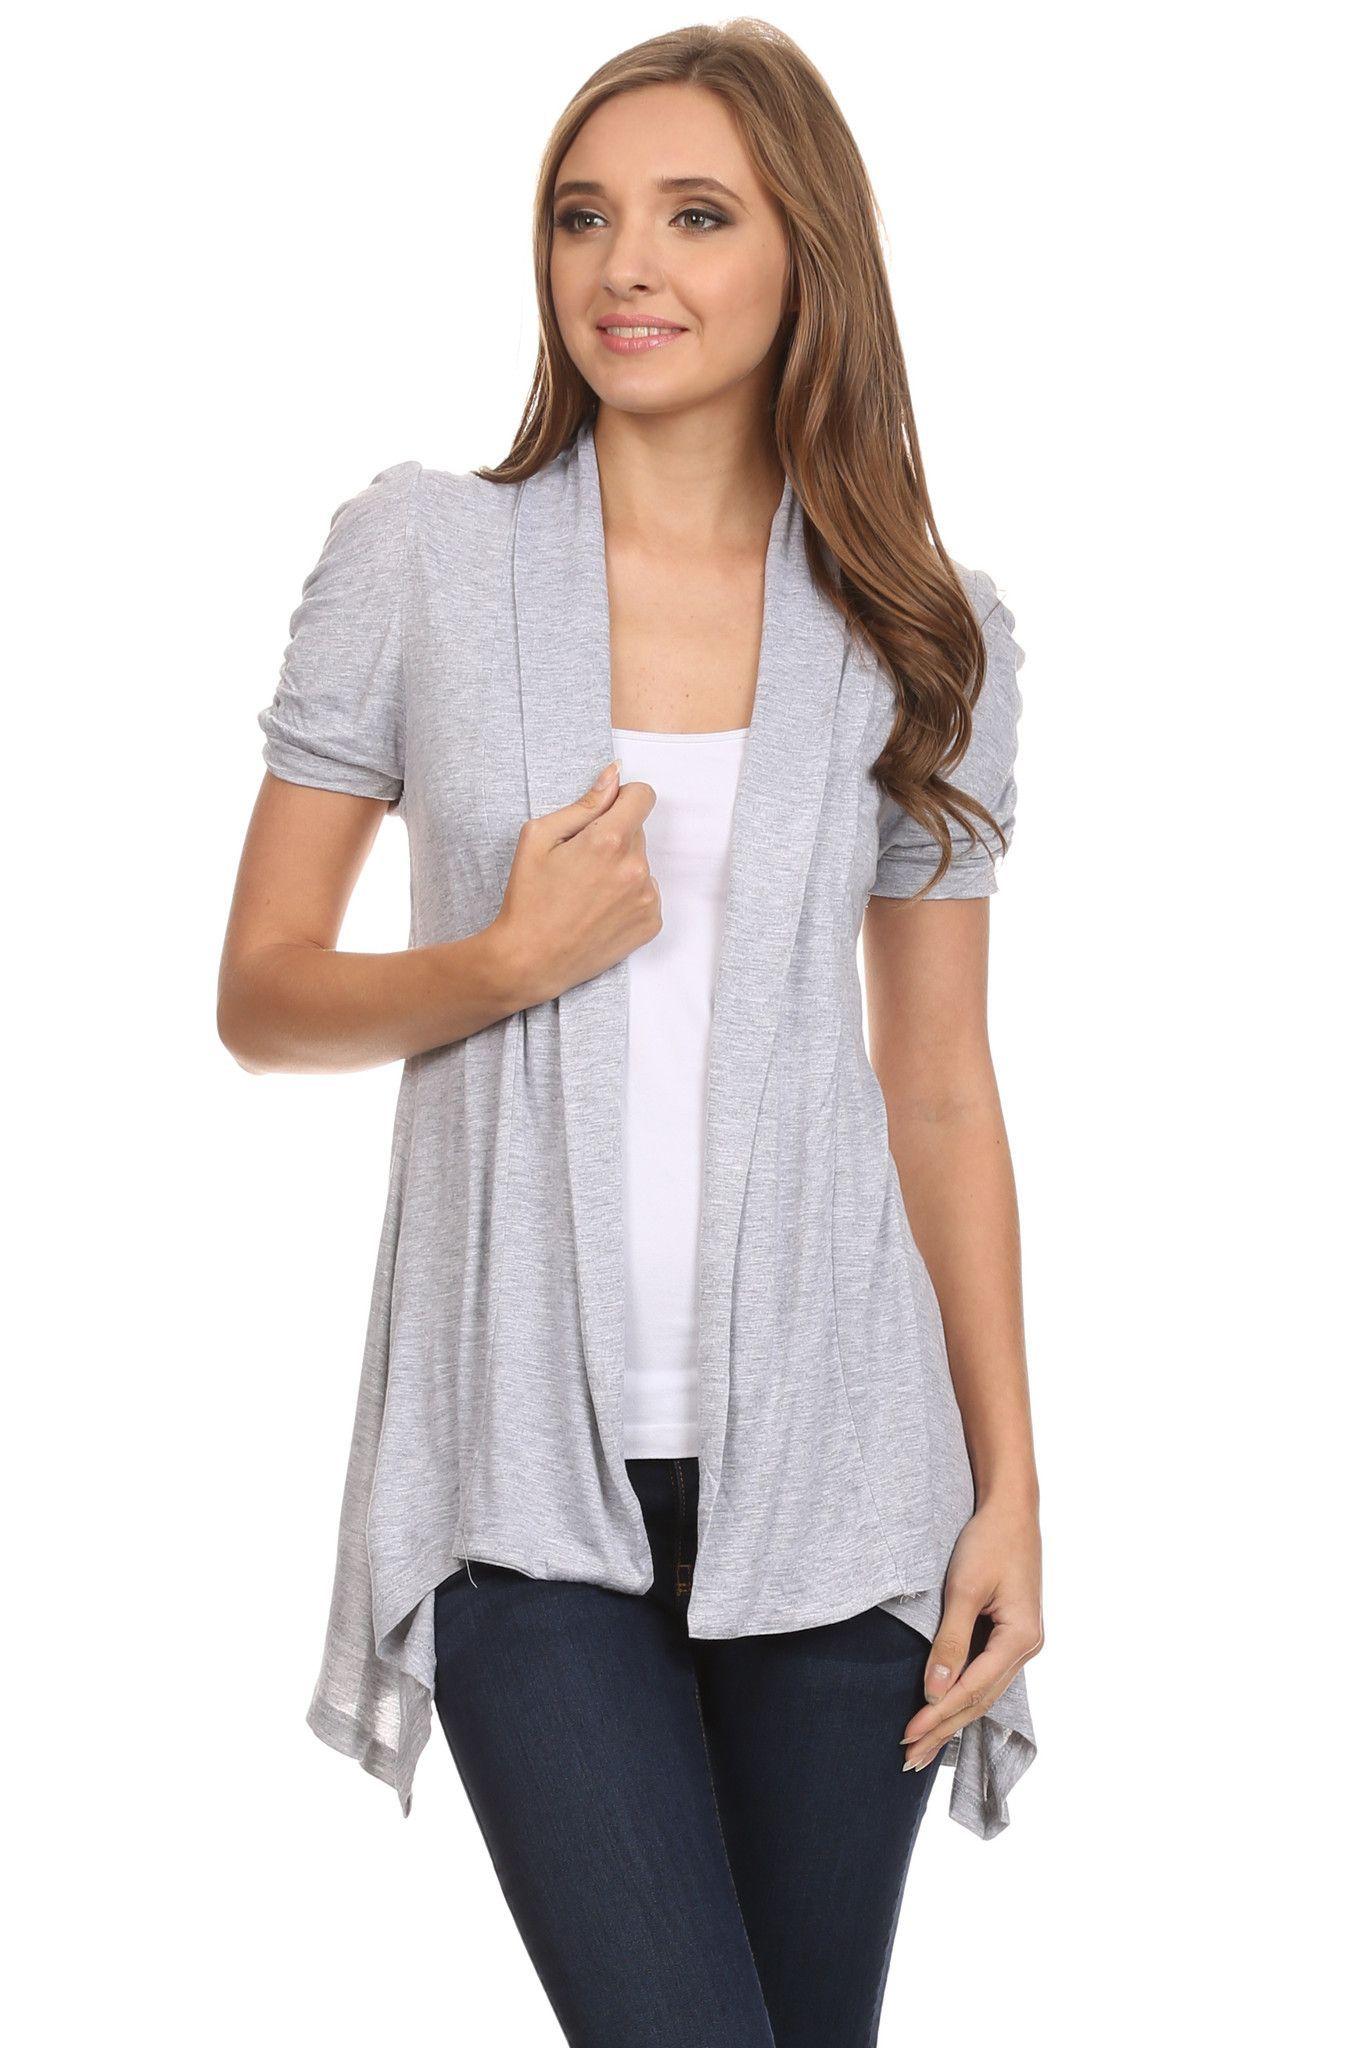 Short Sleeve Cardigan for Women Open Front Draped Flyaway Cardigan ...